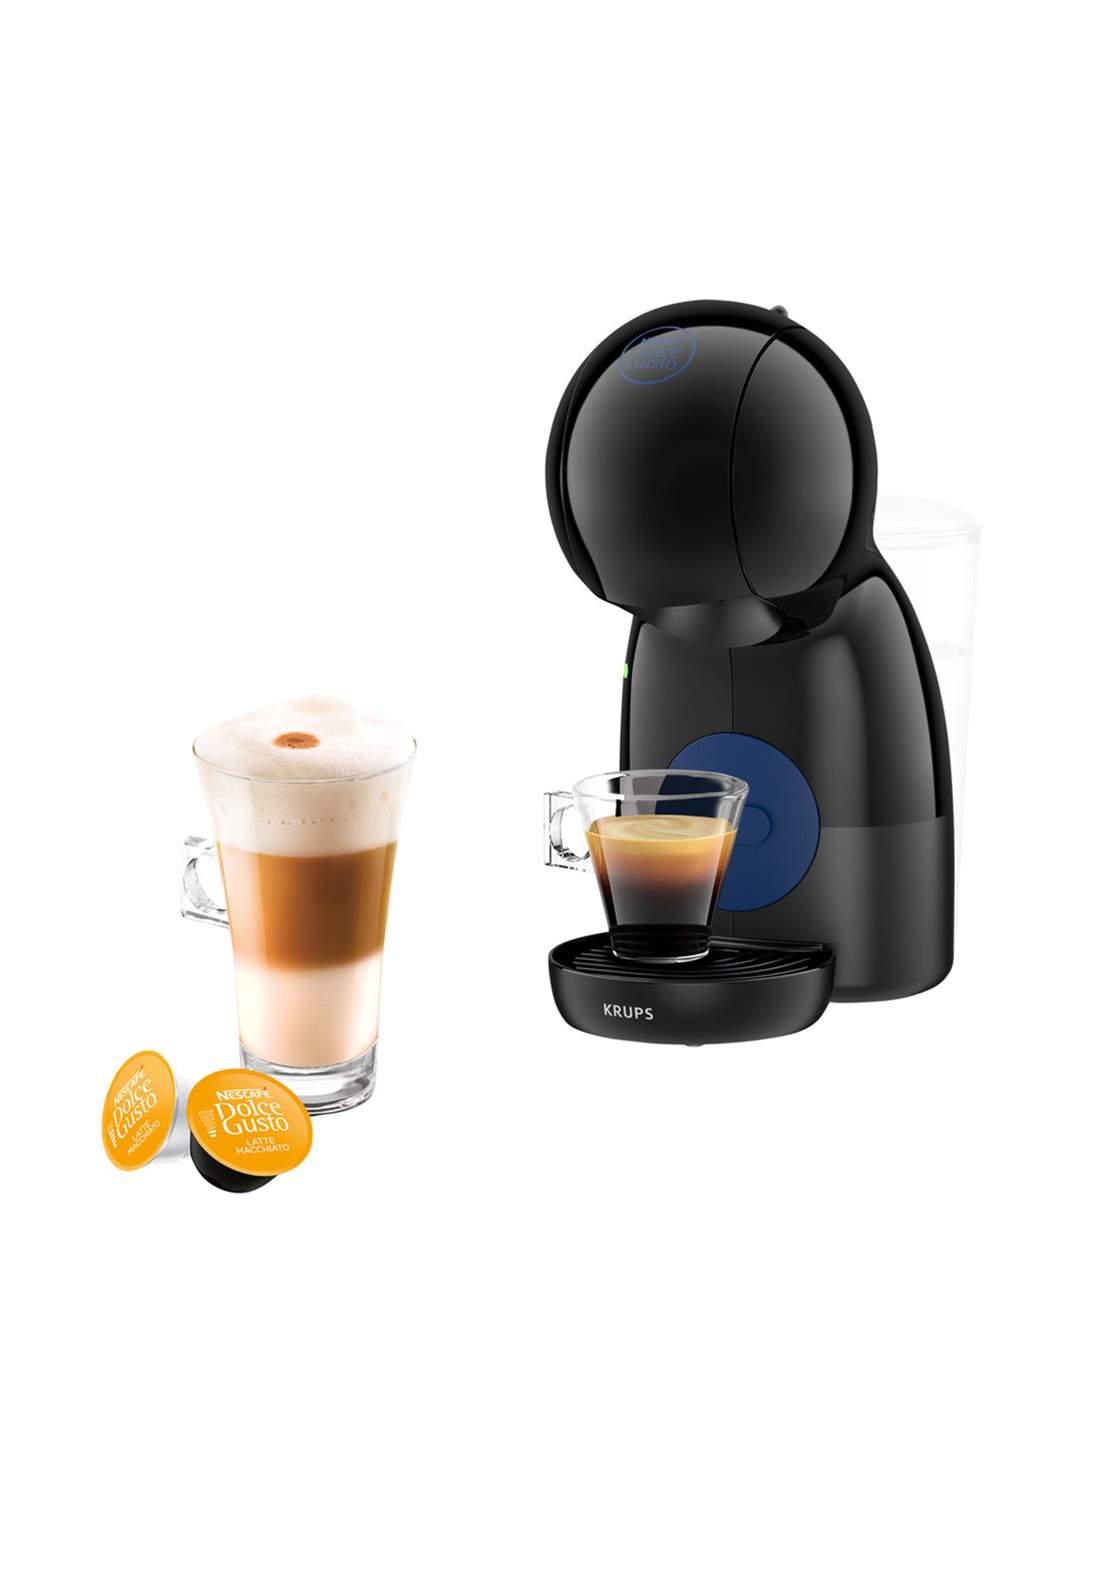 Piccolo KP1A3B Coffe Machine 1600 Watt ماكنة صنع القهوة